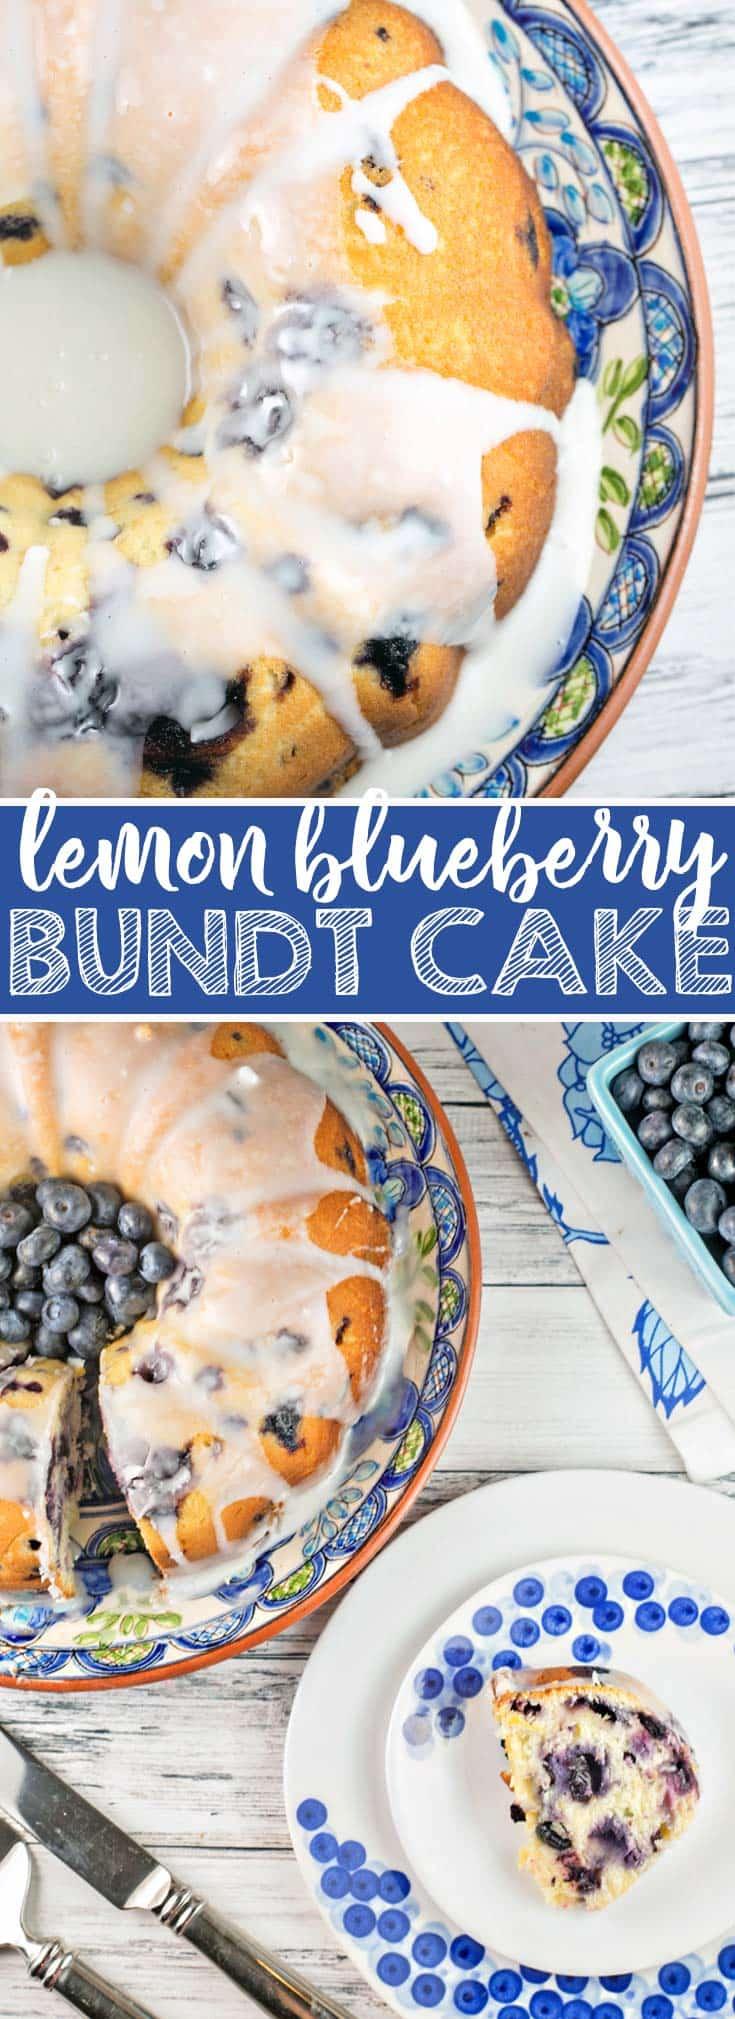 Lemon Blueberry Bundt Cake: the perfect vanilla pound cake, bursting with fresh blueberries and lemon zest, topped with a sweet lemon glaze. It's the perfect year-round treat! {Bunsen Burner Bakery}